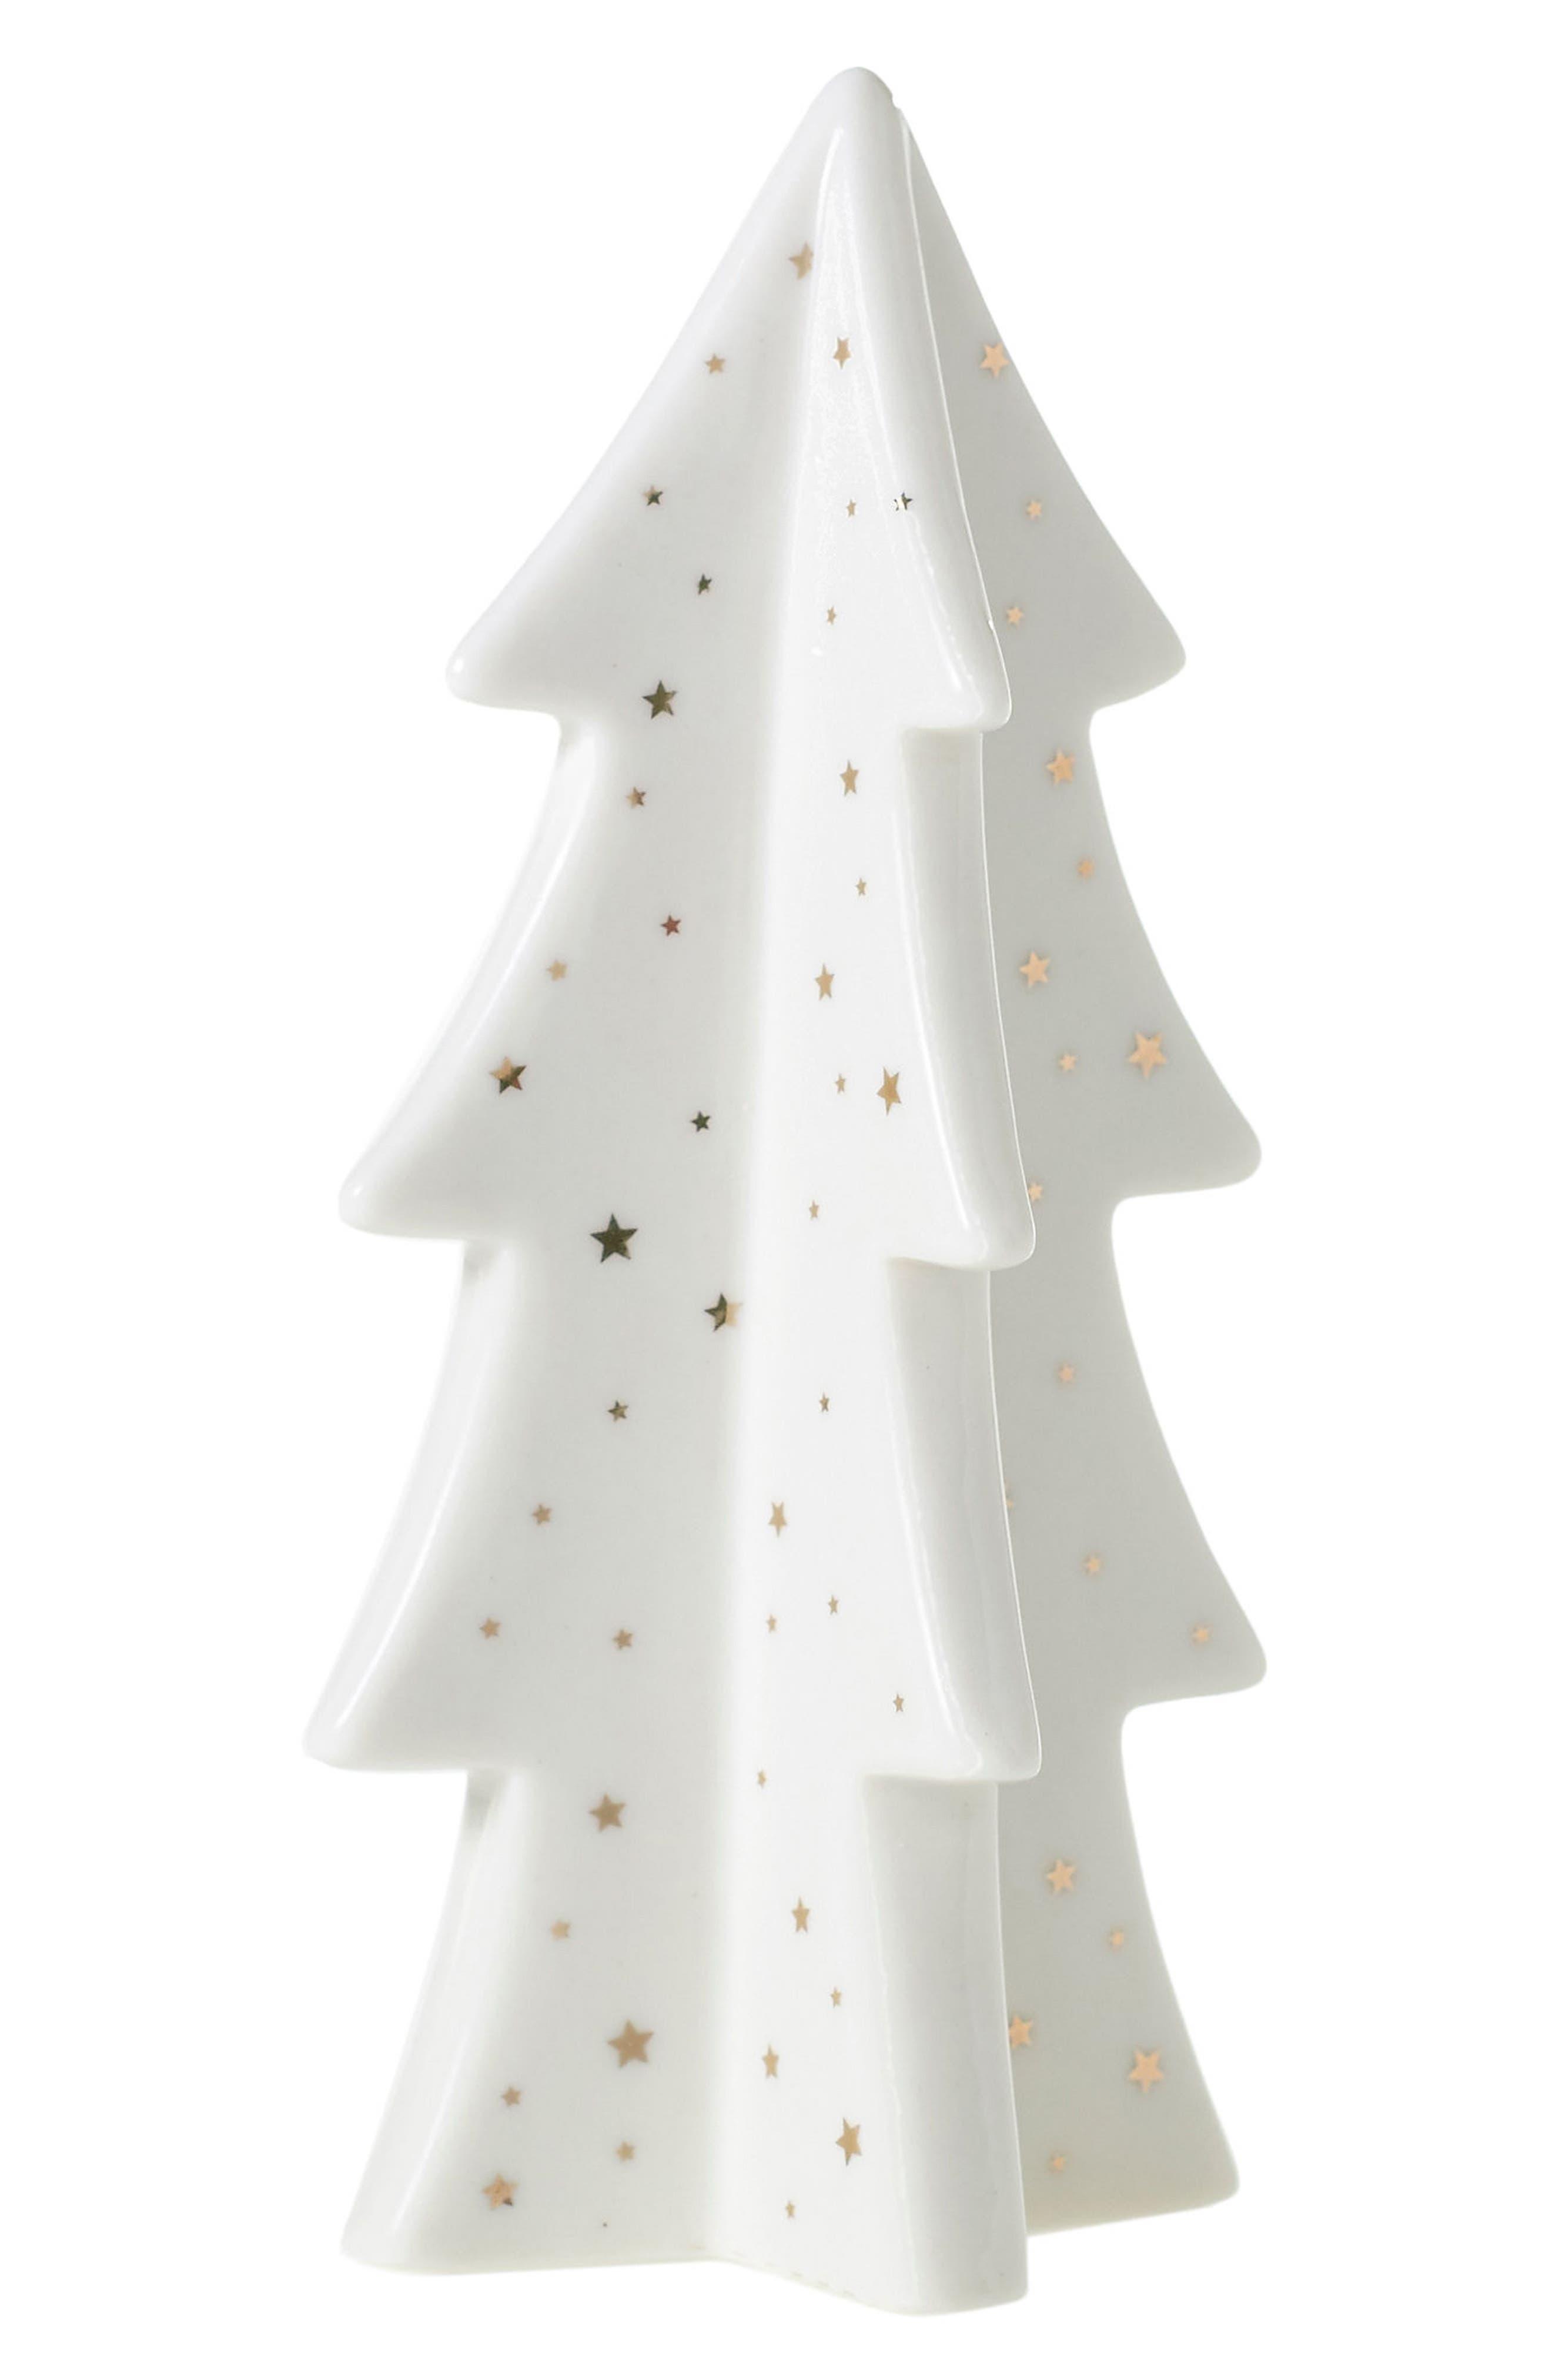 Alternate Image 1 Selected - Accent Decor Aglow Porcelain Tree